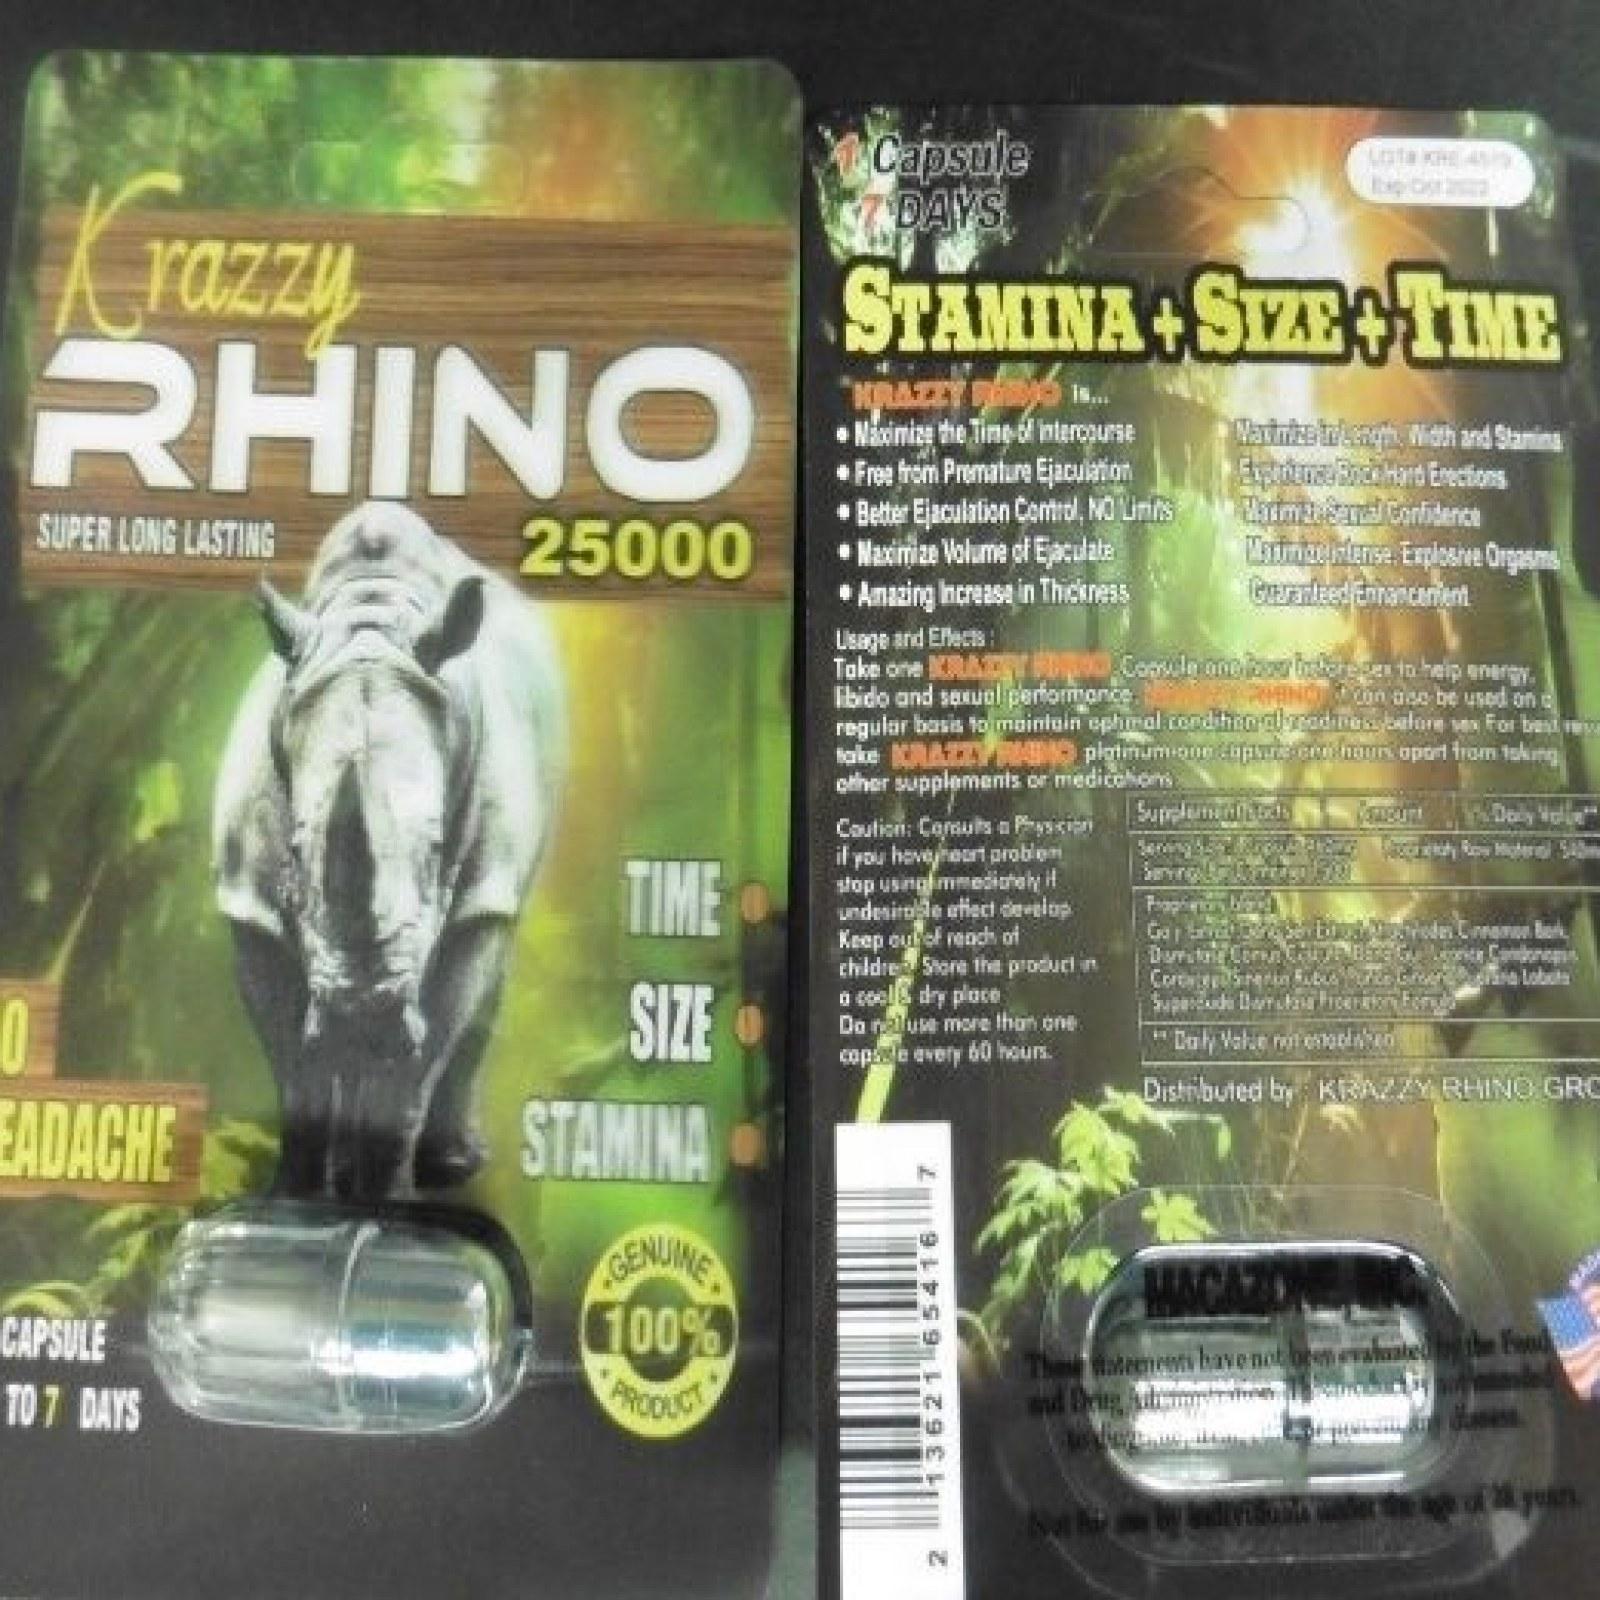 FDA Warns Men: 'Dangerous' Rhino Sexual Enhancement Products Cause